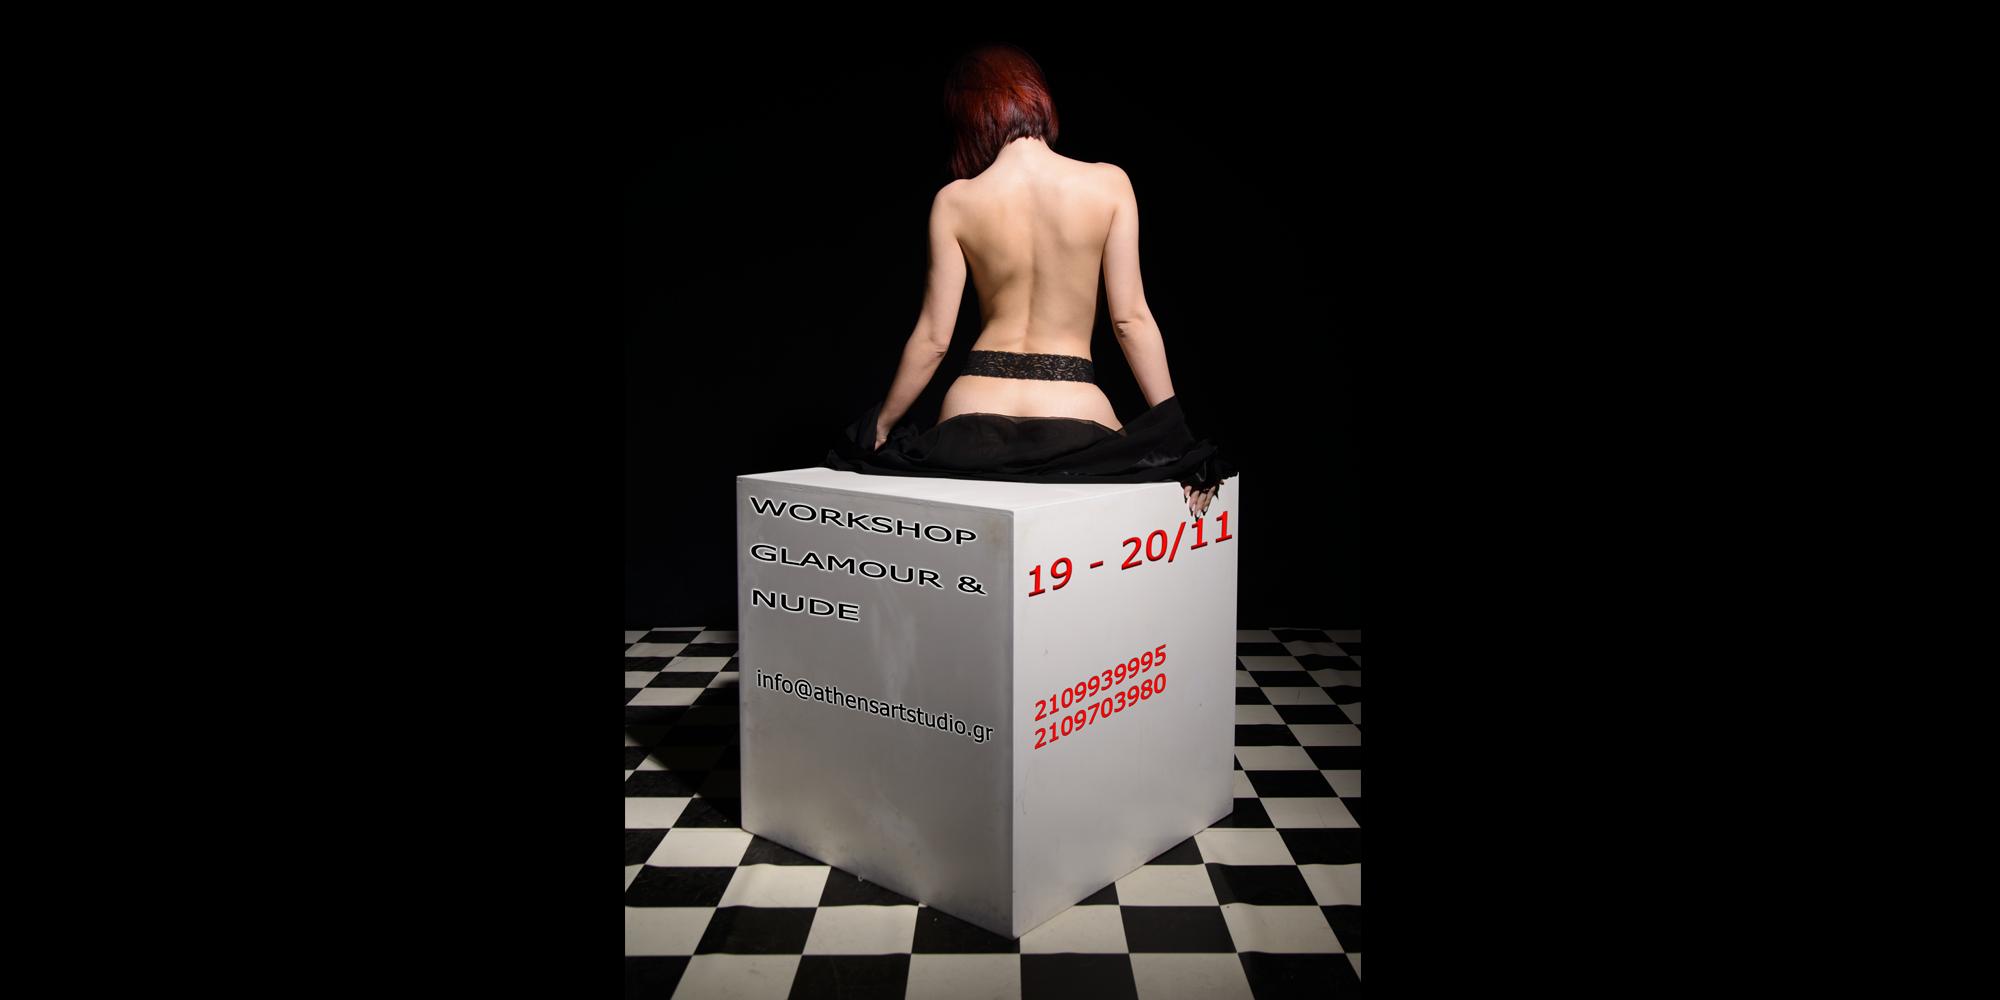 nude-workshop2016